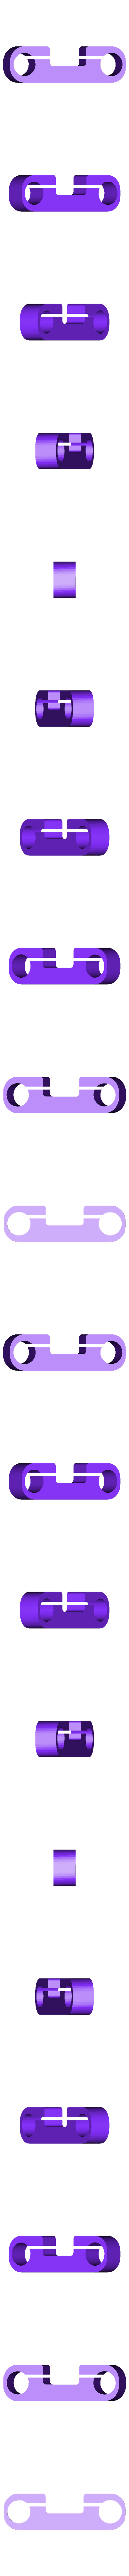 rail_clamp.STL Download free STL file 15mm Rail System Clamp • 3D printer design, Werthrante